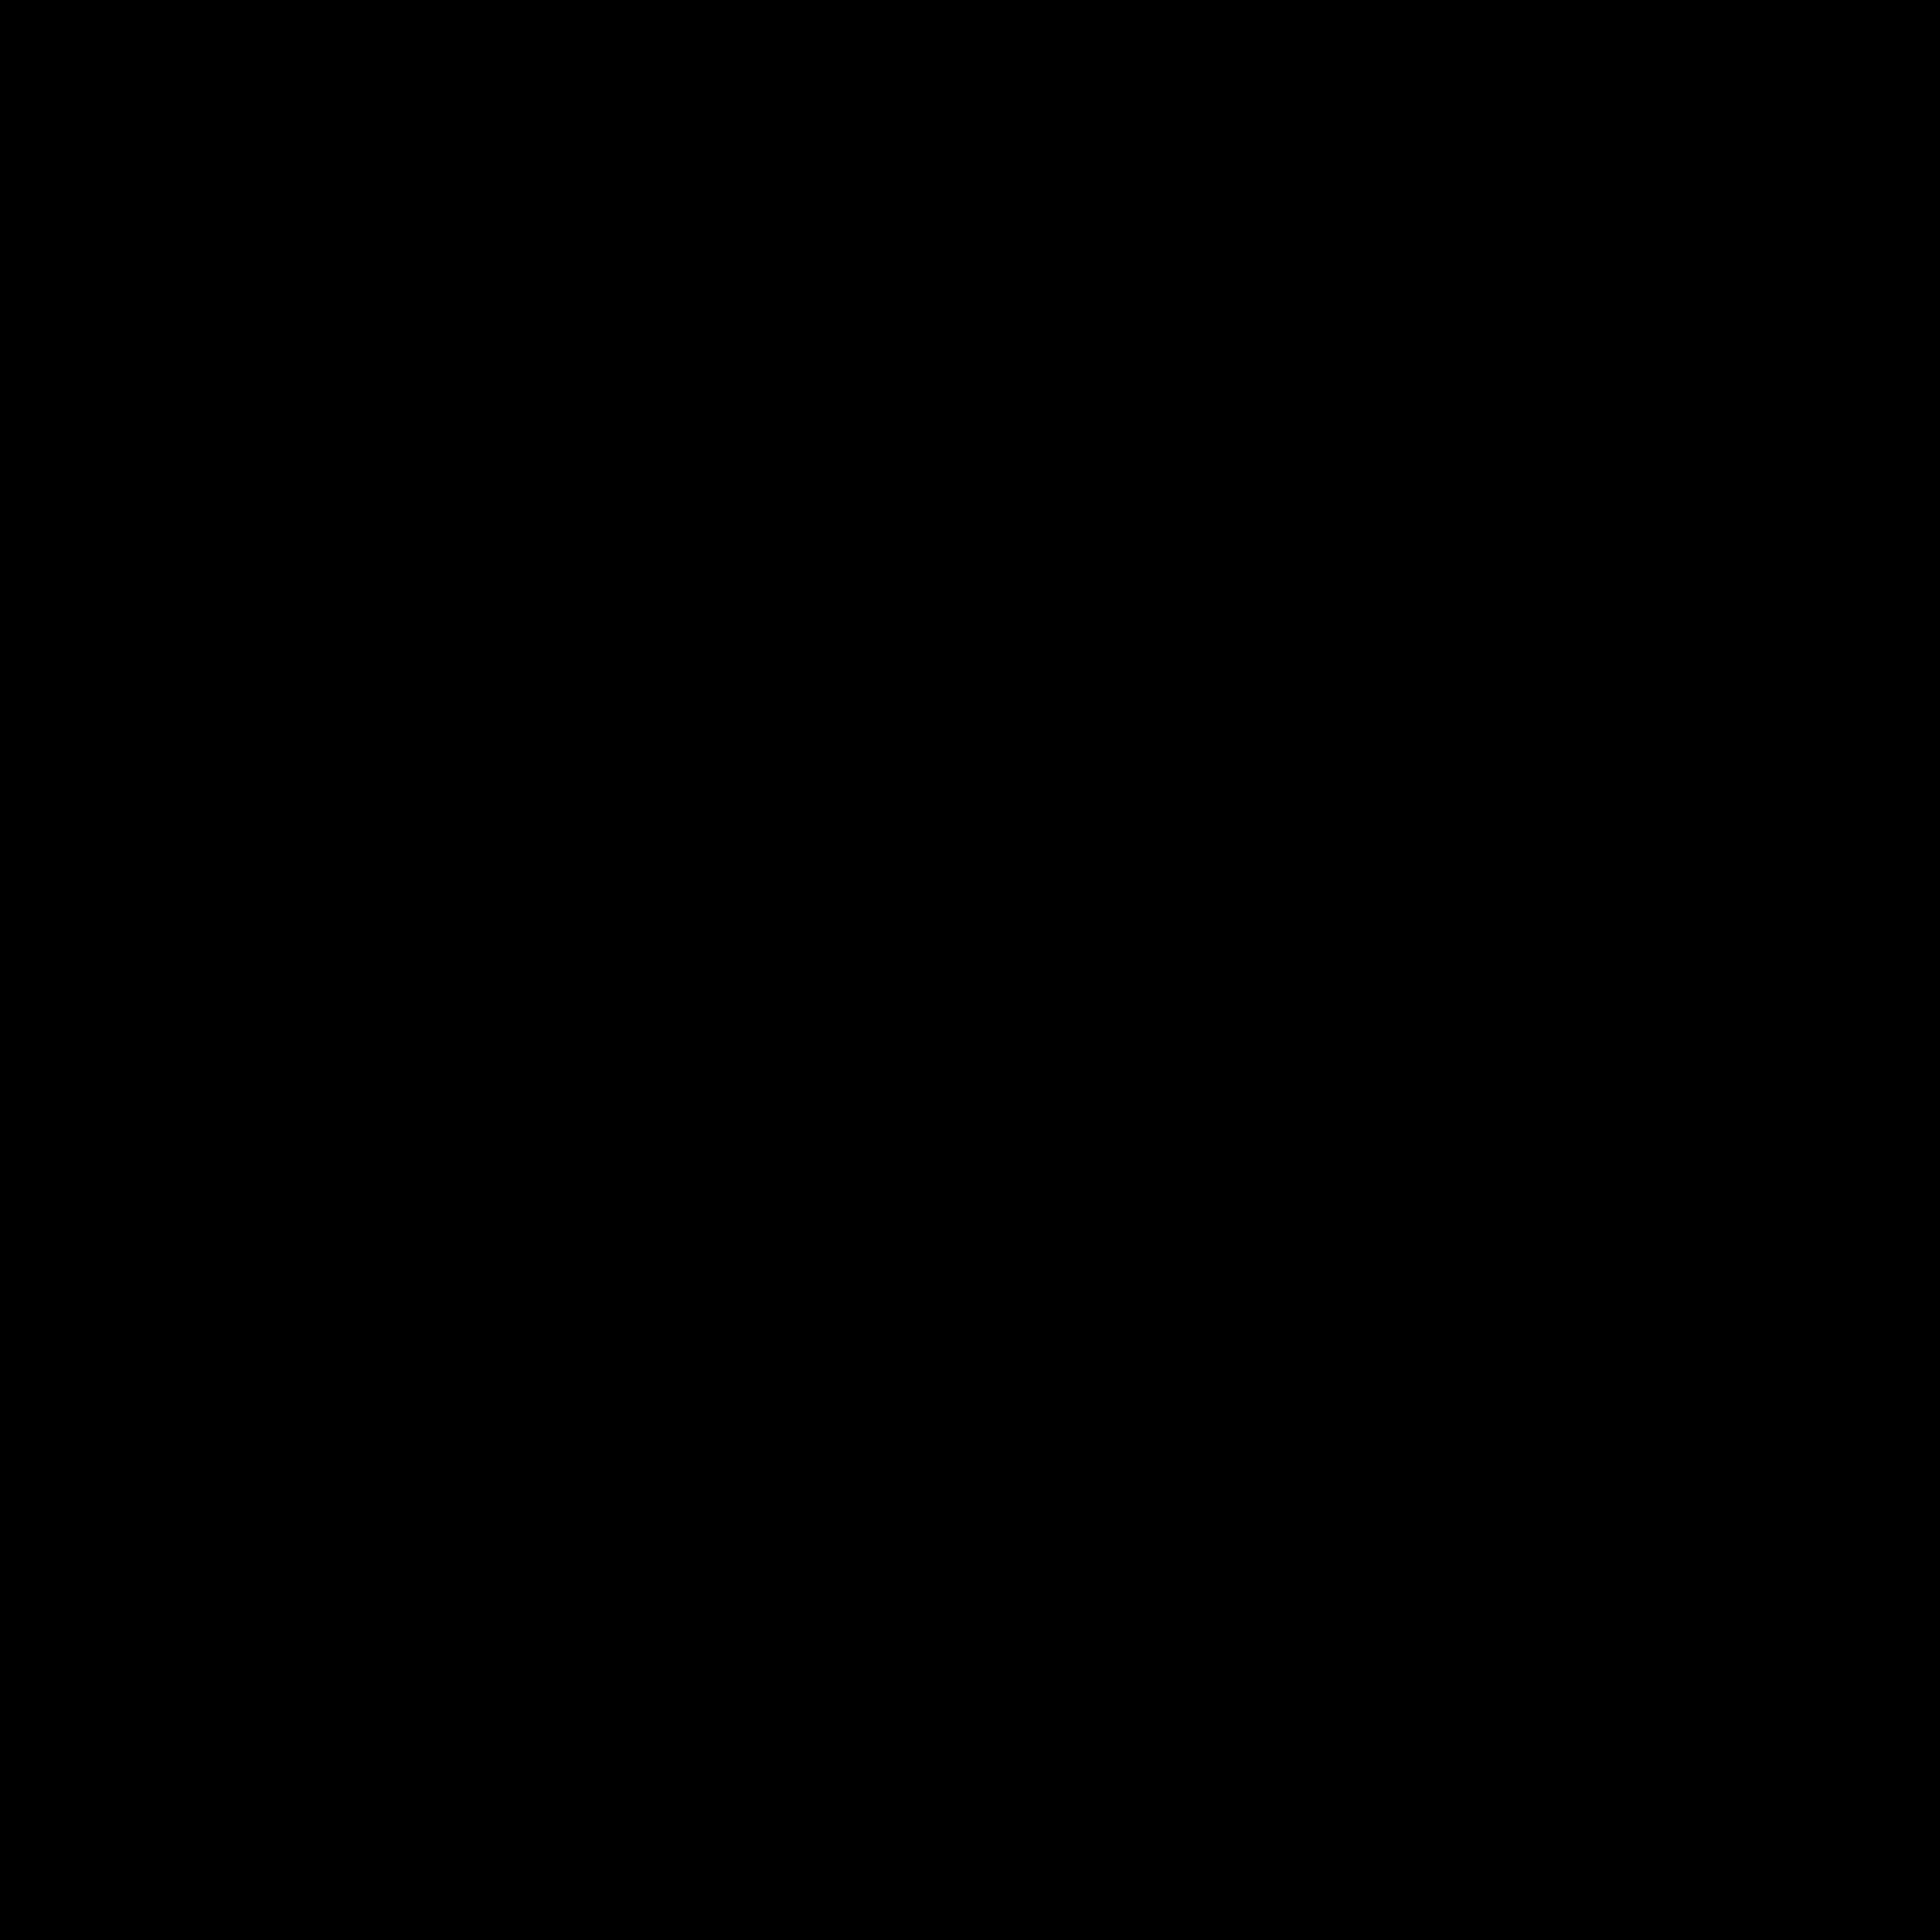 Logo png transparent vector. Shell clipart svg